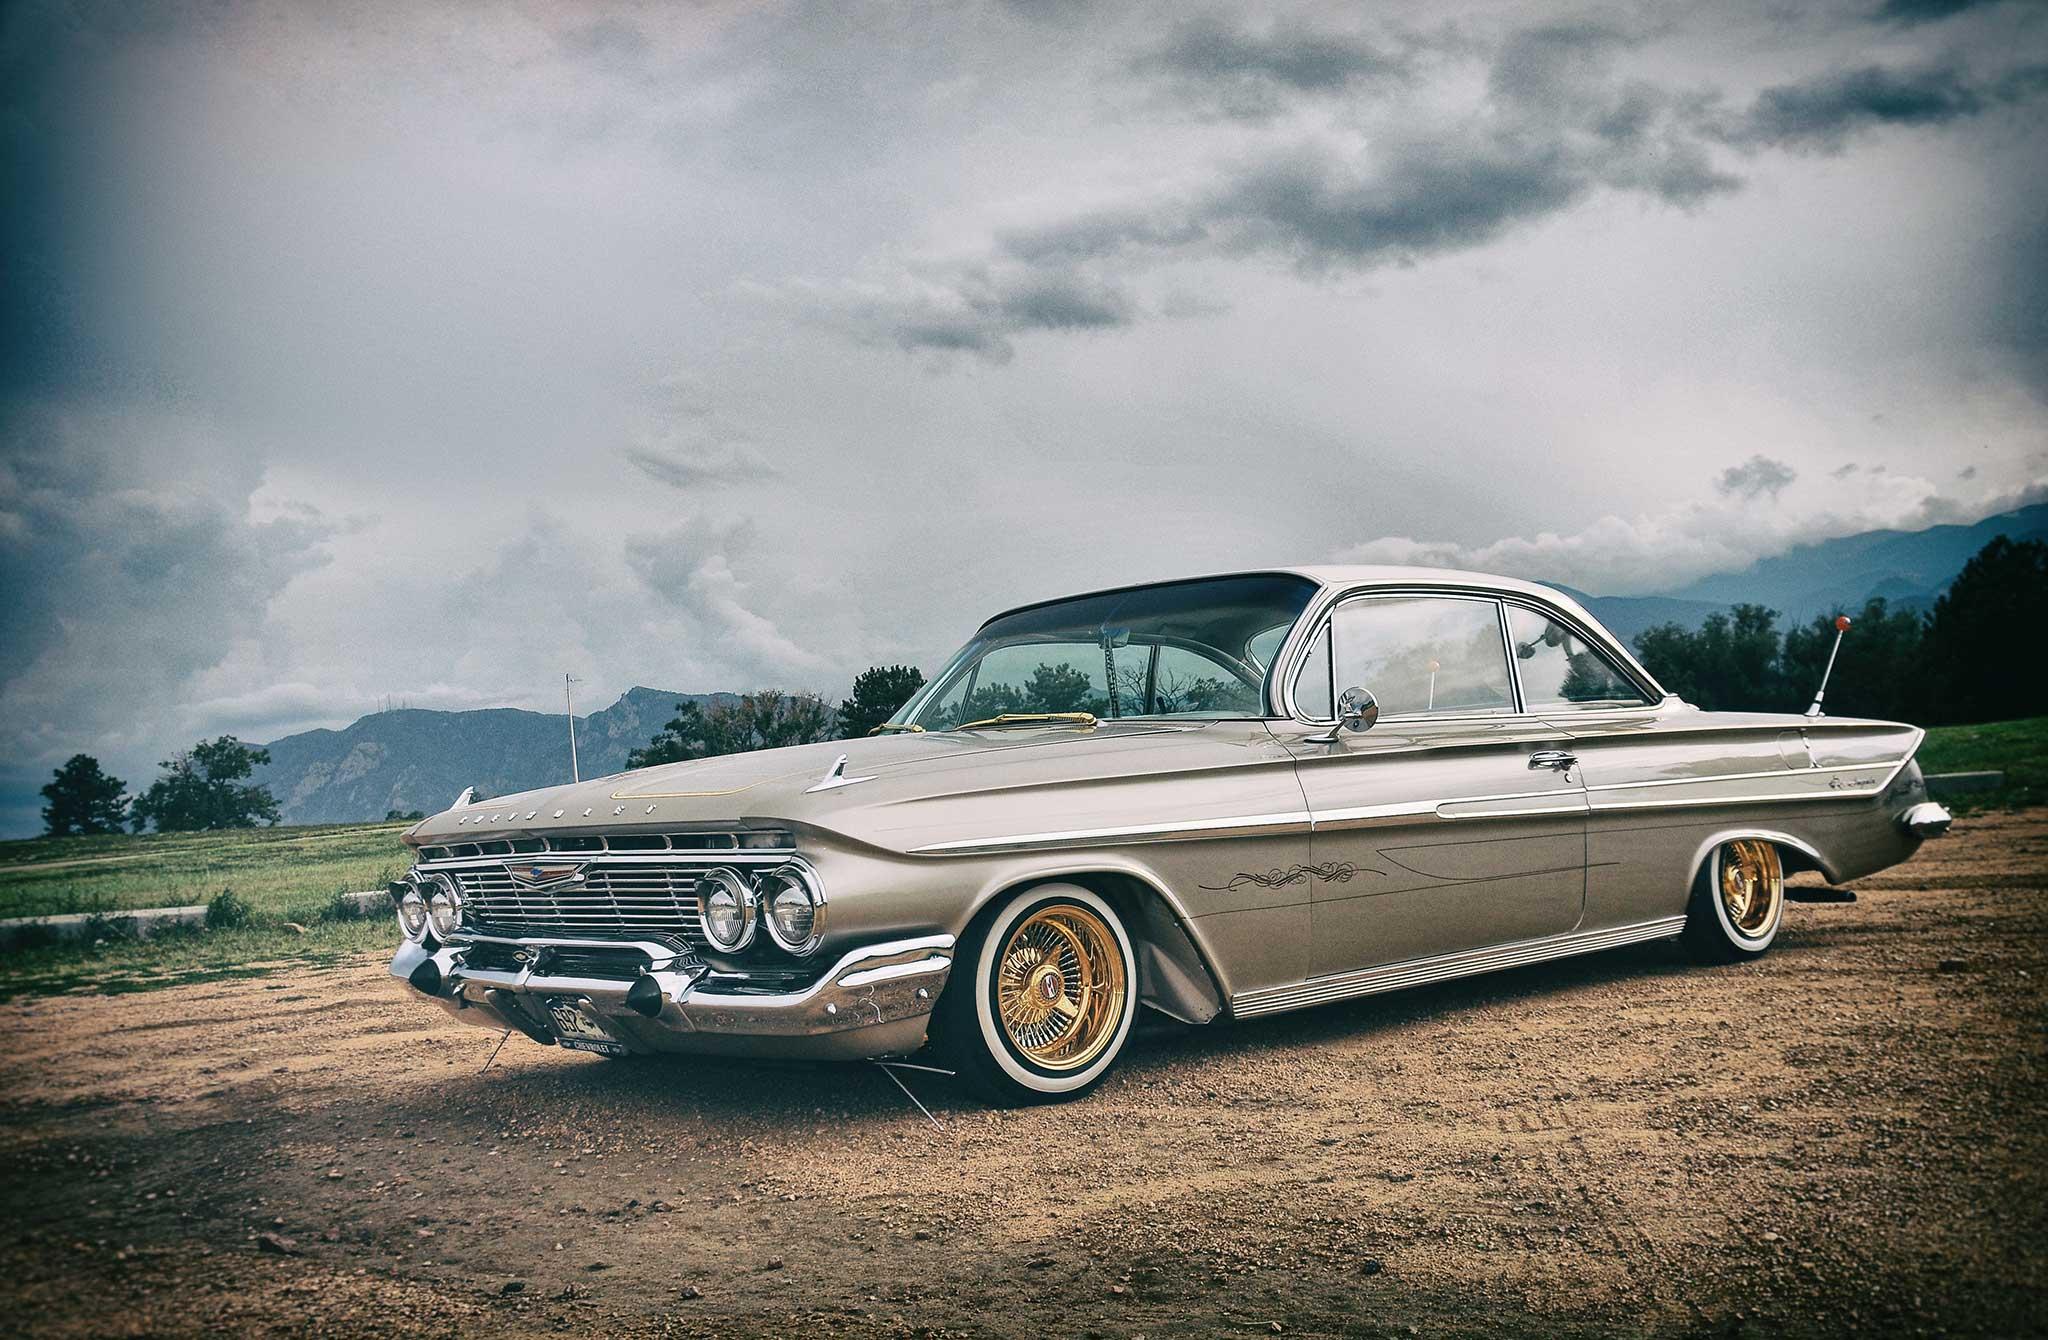 1961 Chevrolet Impala - Precious Metals - Lowrider